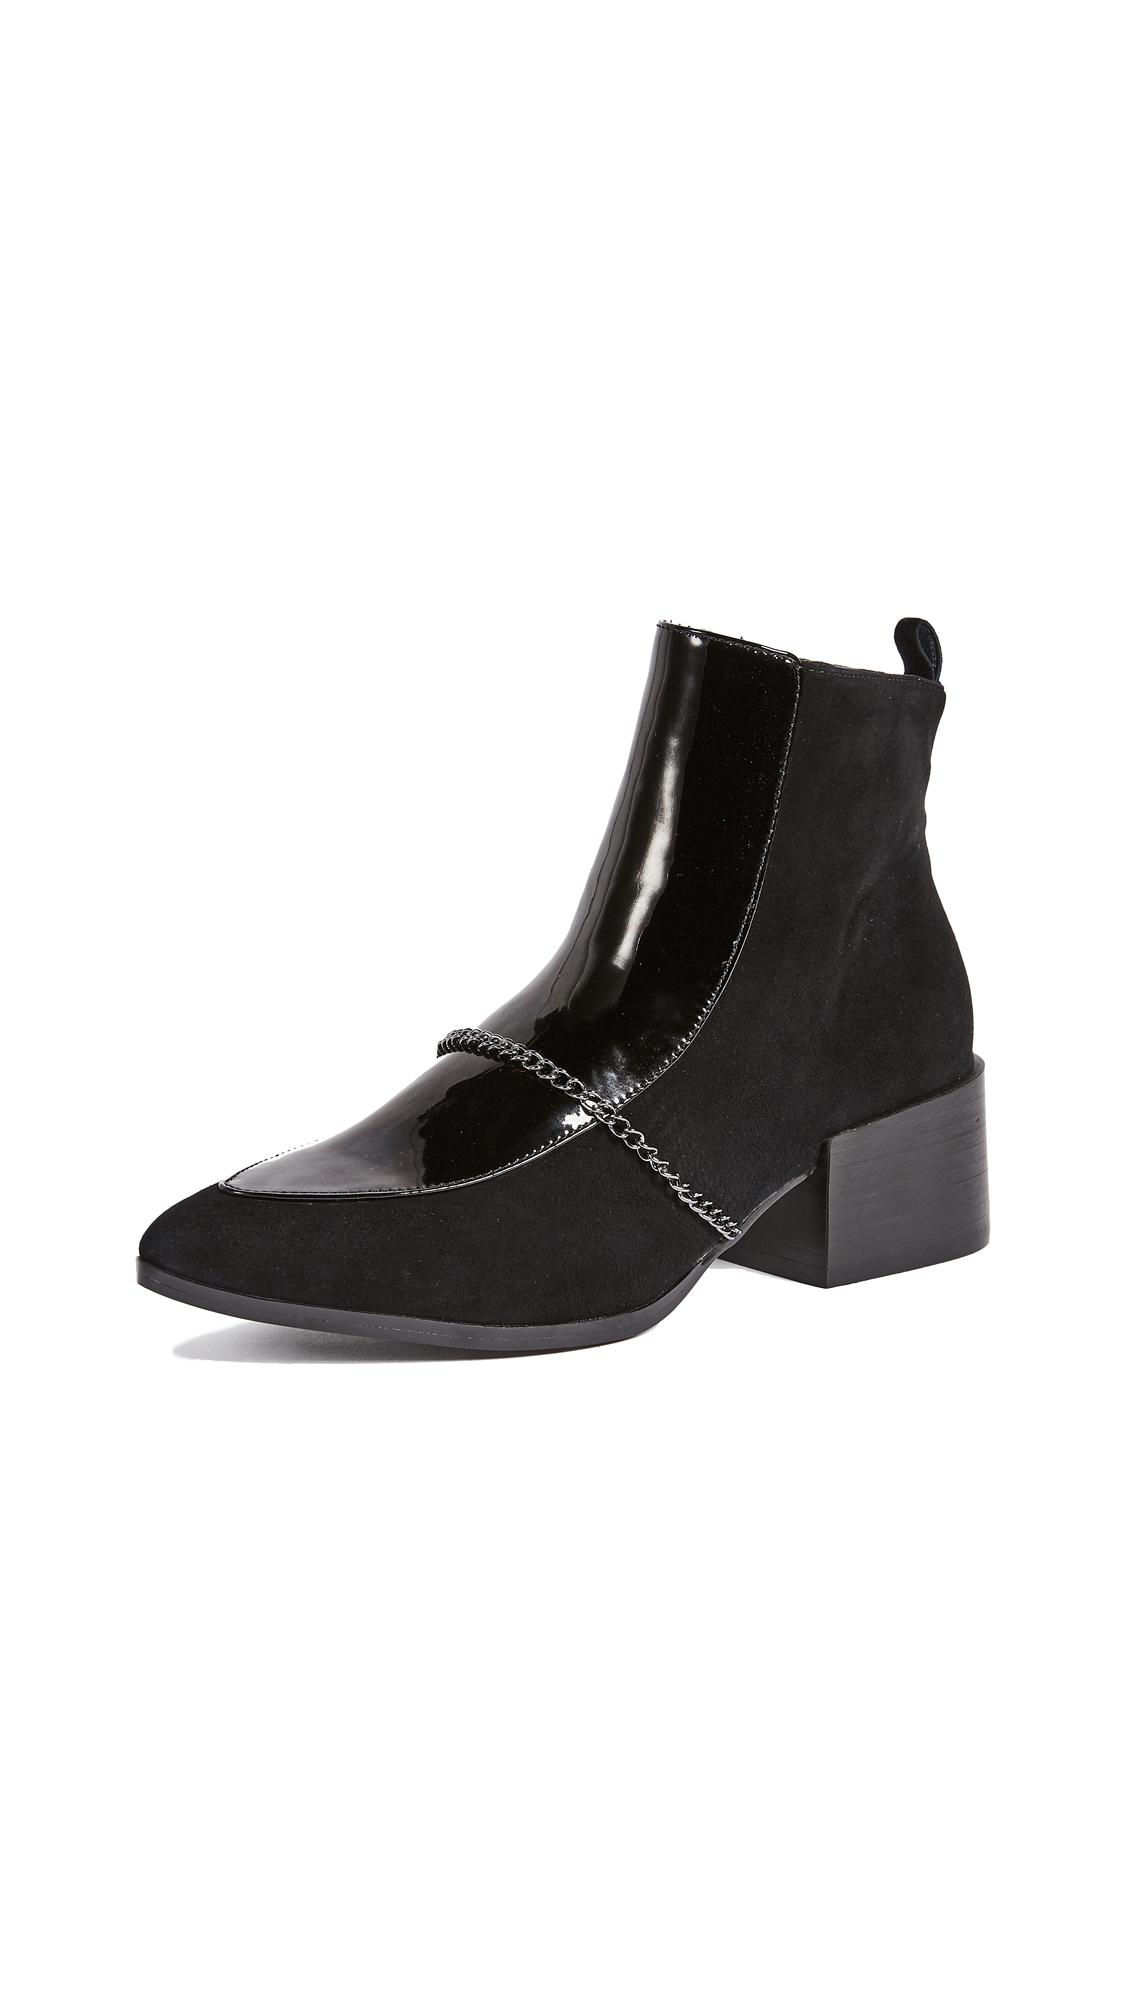 JAGGAR Block Heel Suede Boots - Black